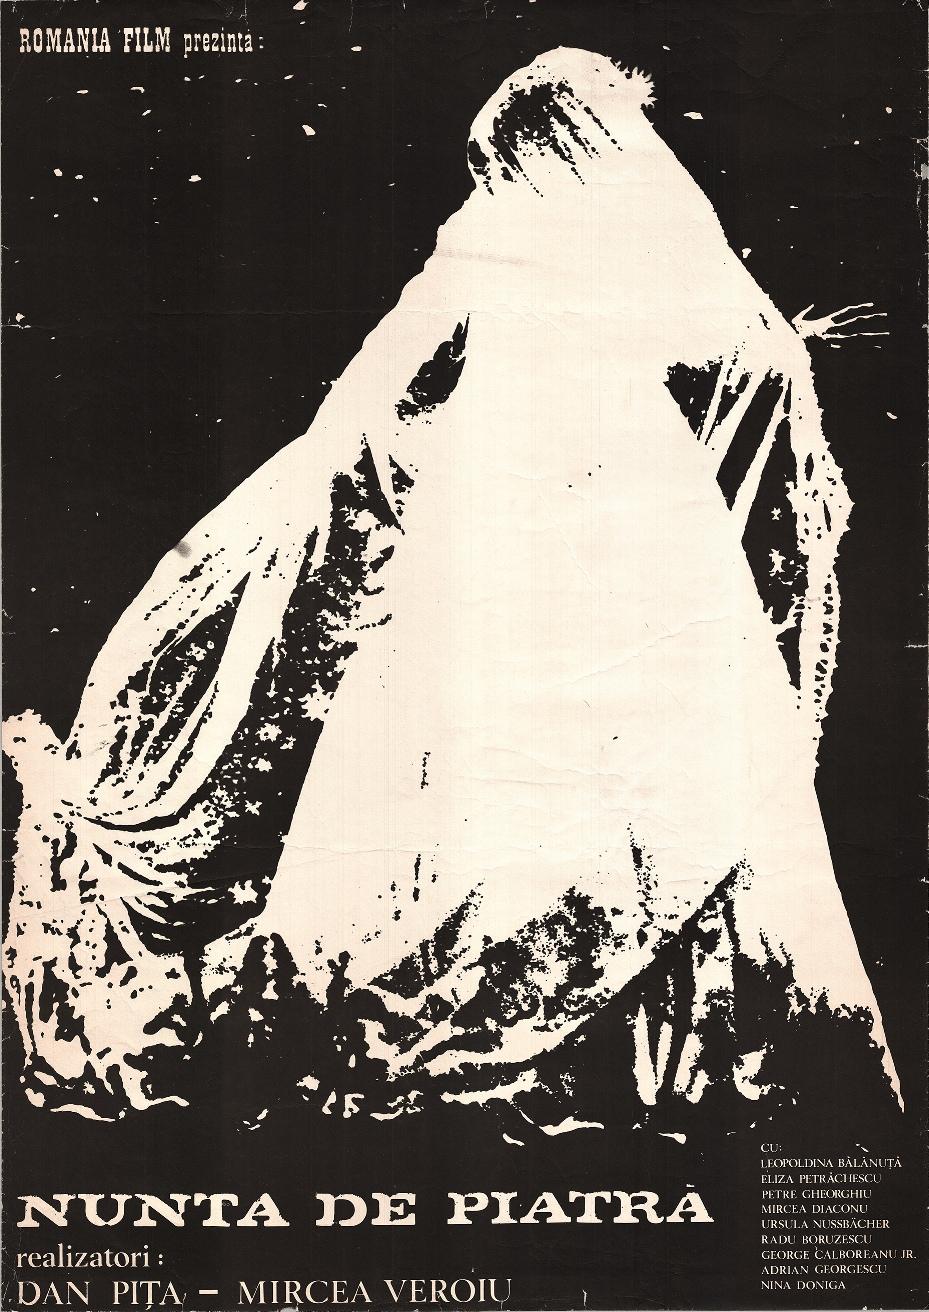 Nunta de piatră (1971) - Photo